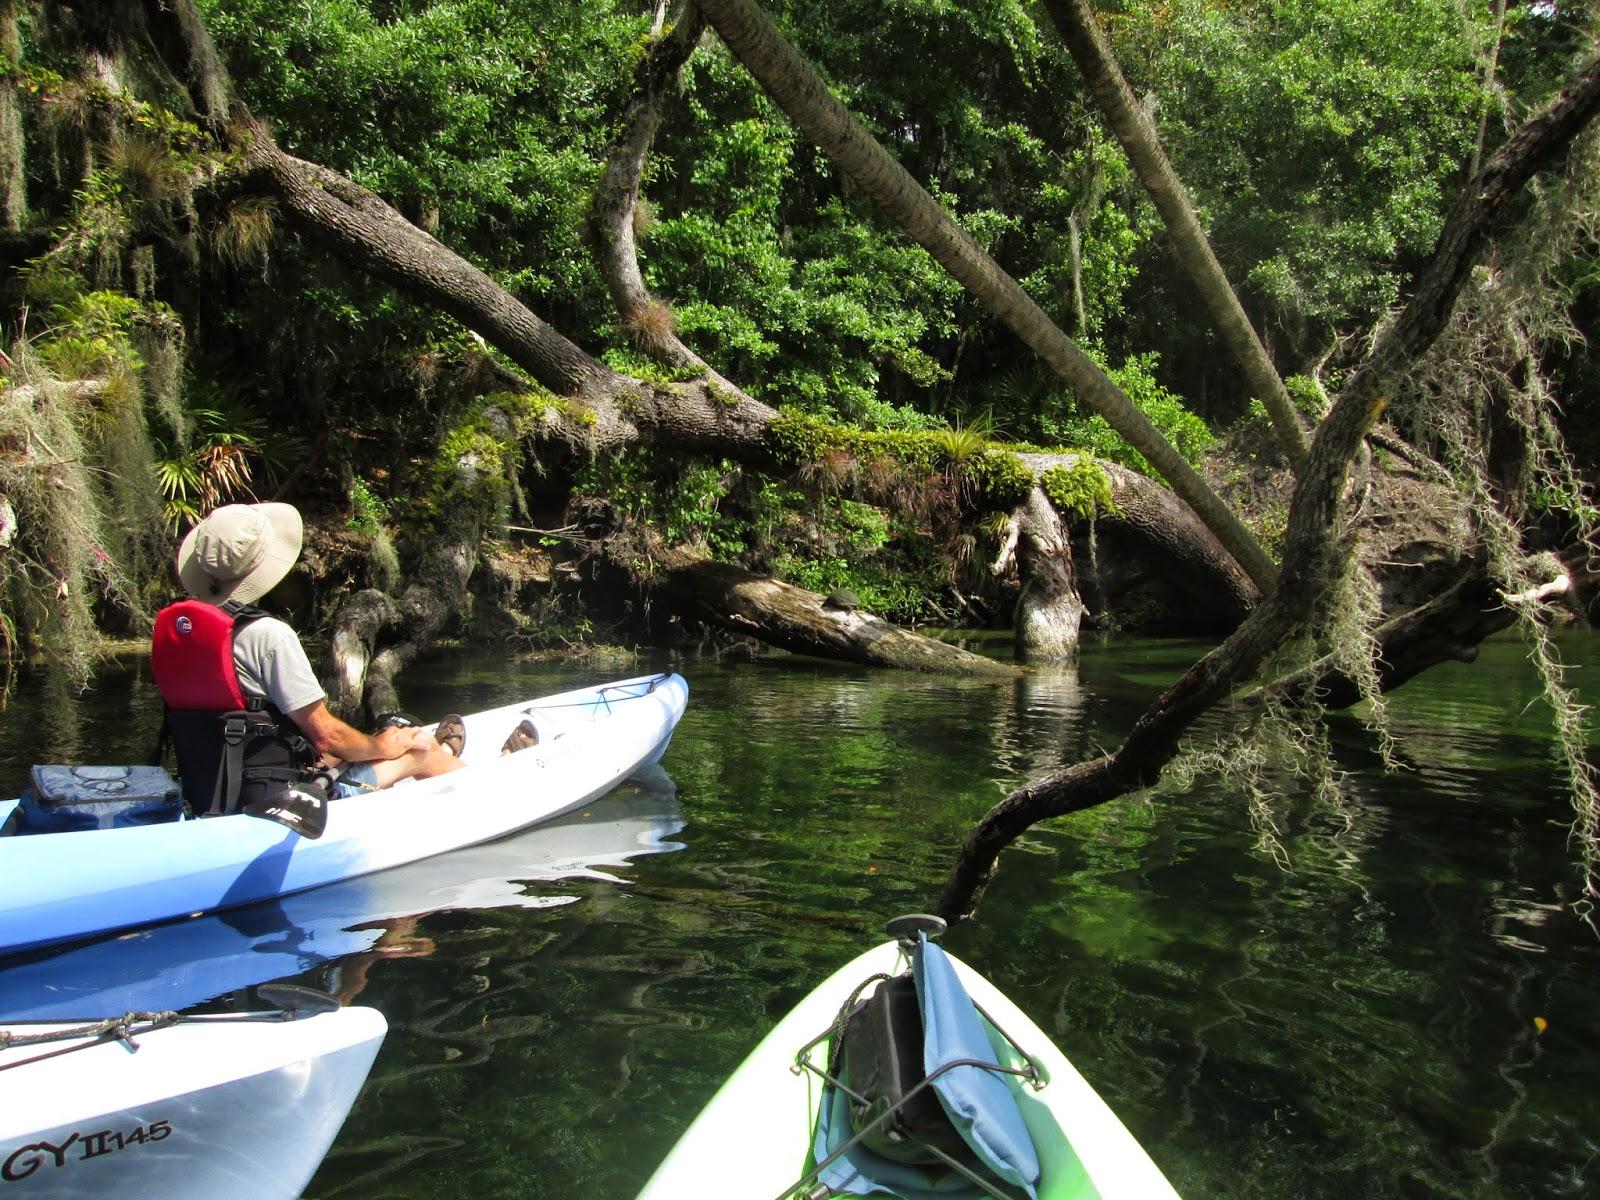 Guided Kayak Trips in Orlando